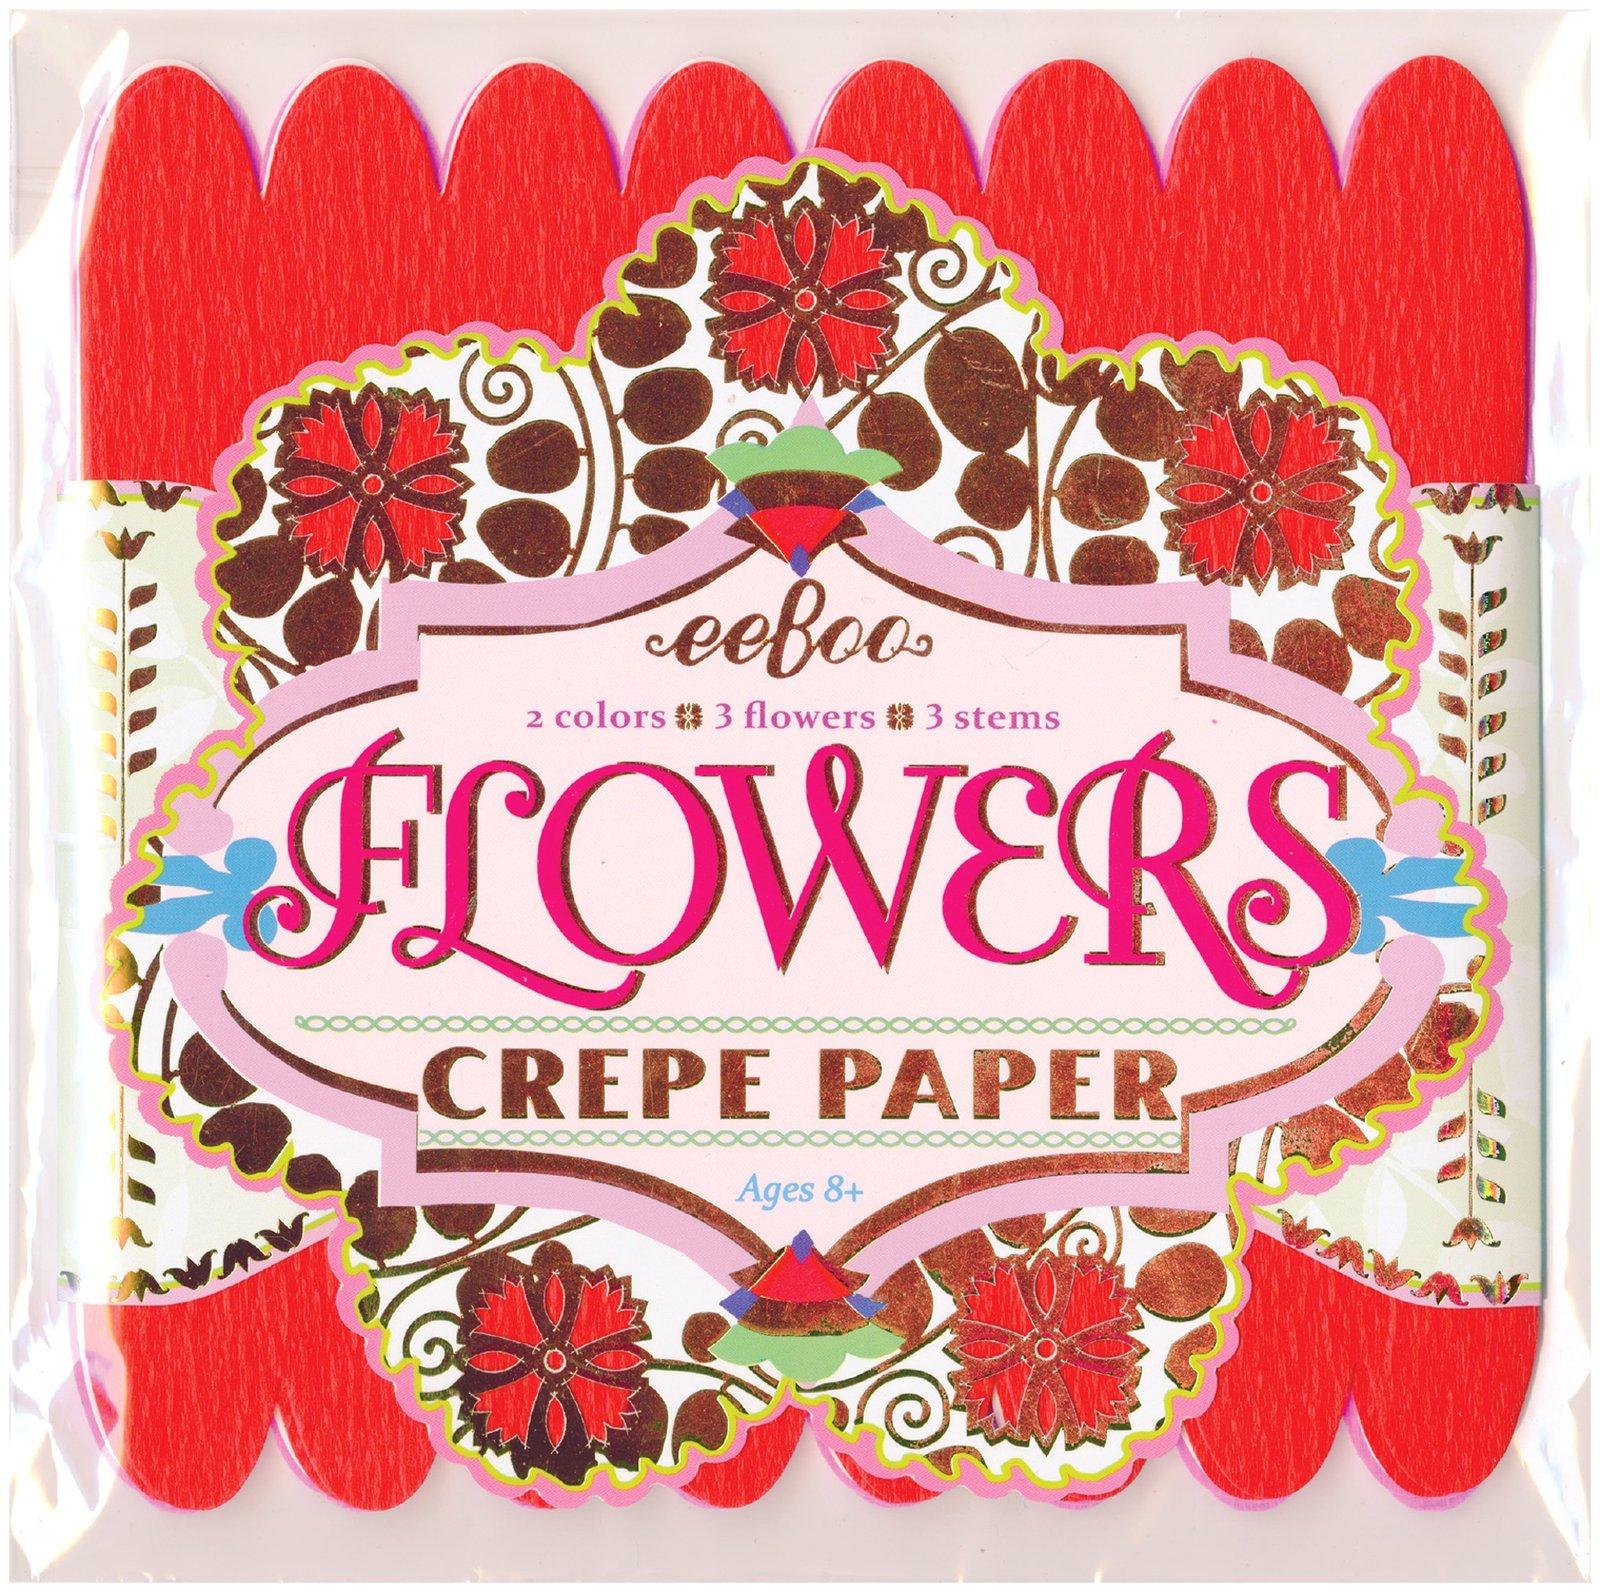 Cheap Crepe Paper Flower Balls Find Crepe Paper Flower Balls Deals